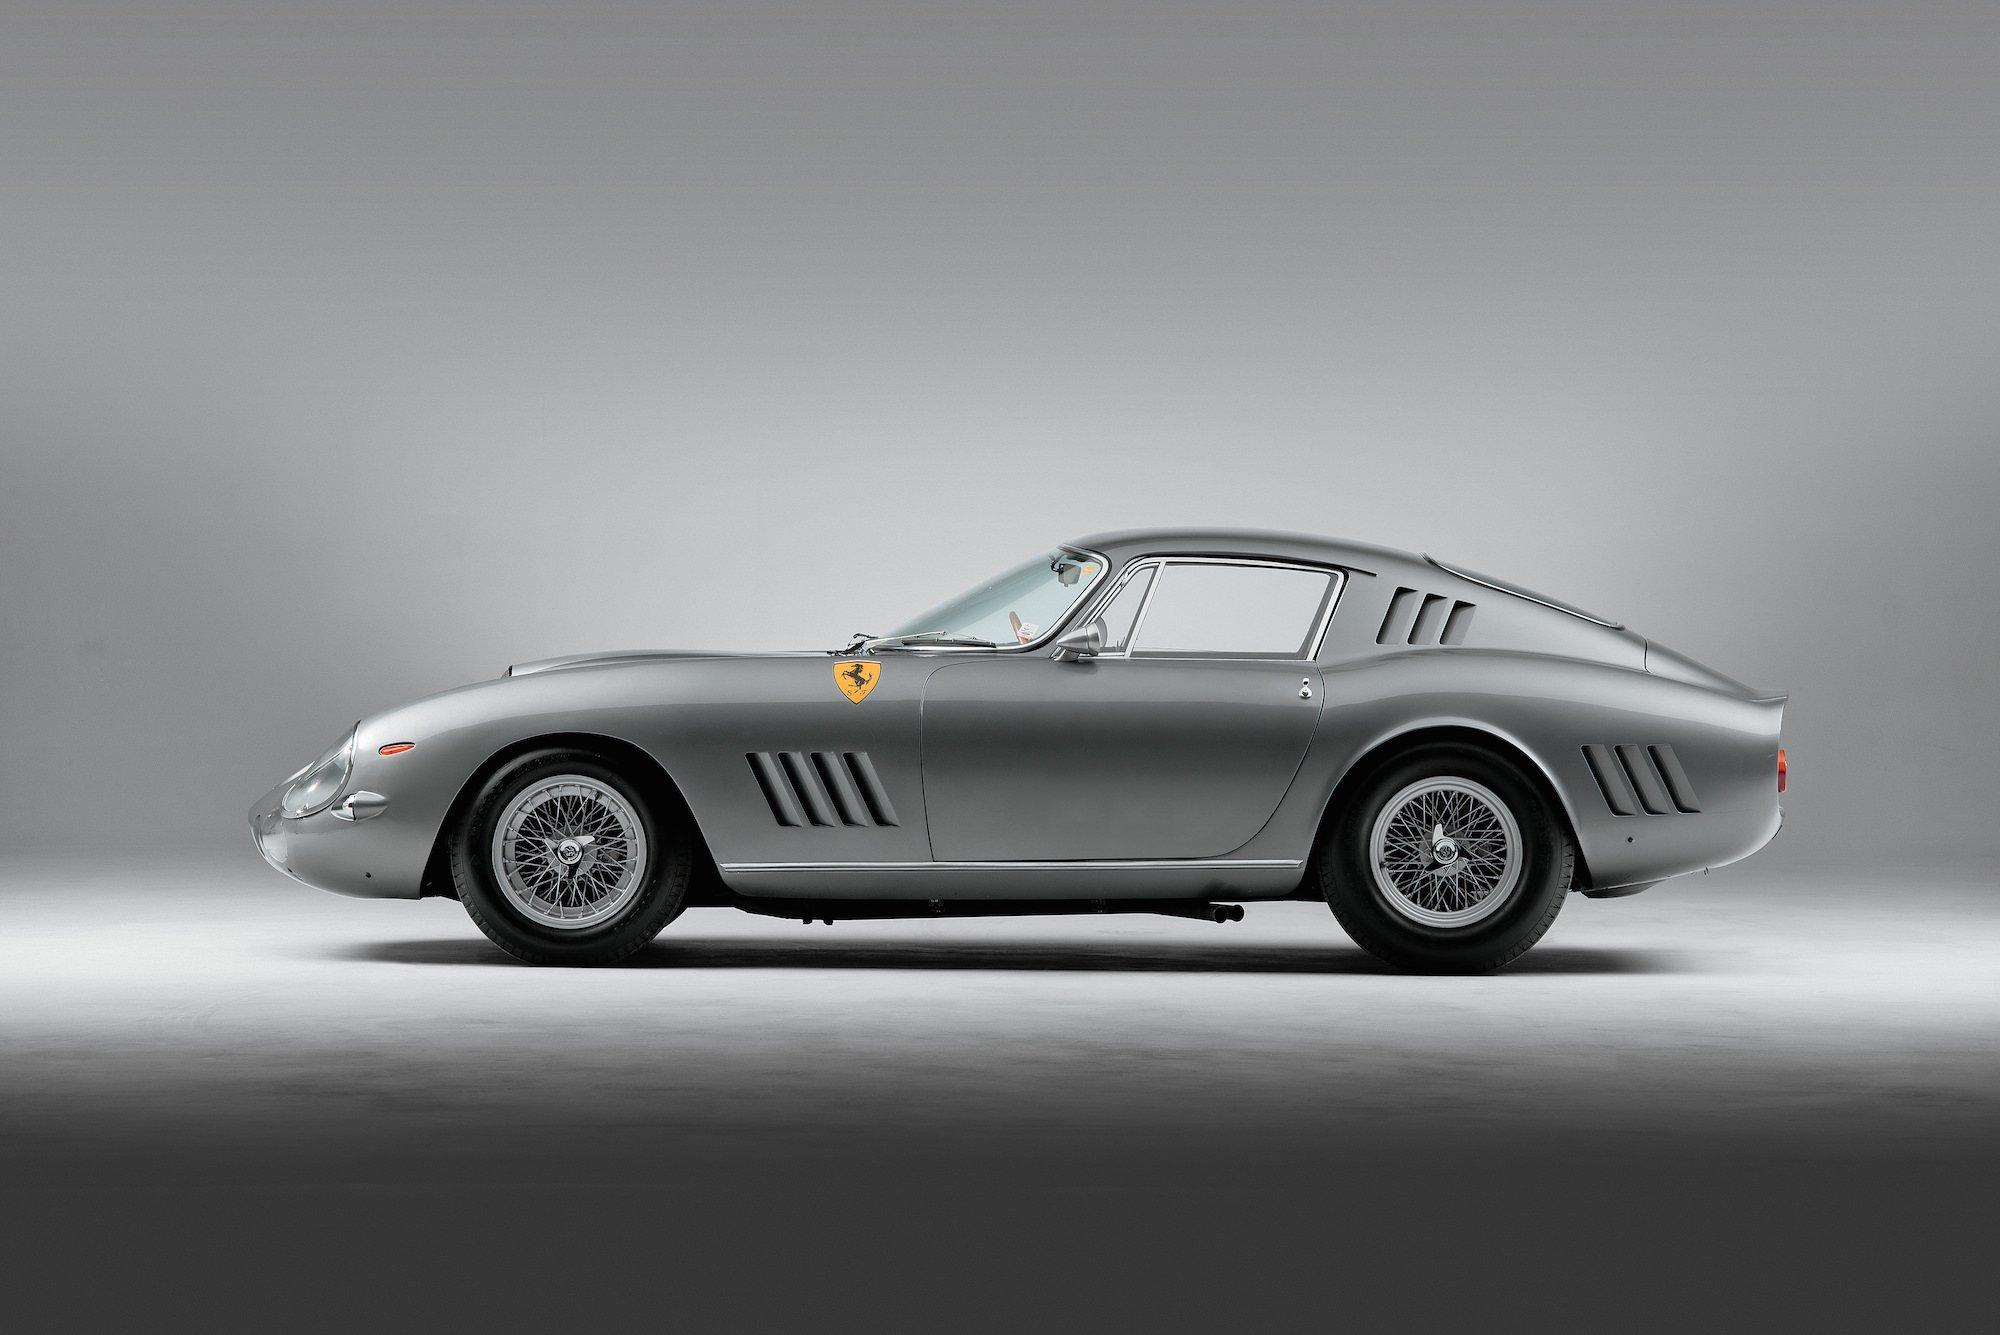 1964 Ferrari 275 Gtb C Speciale